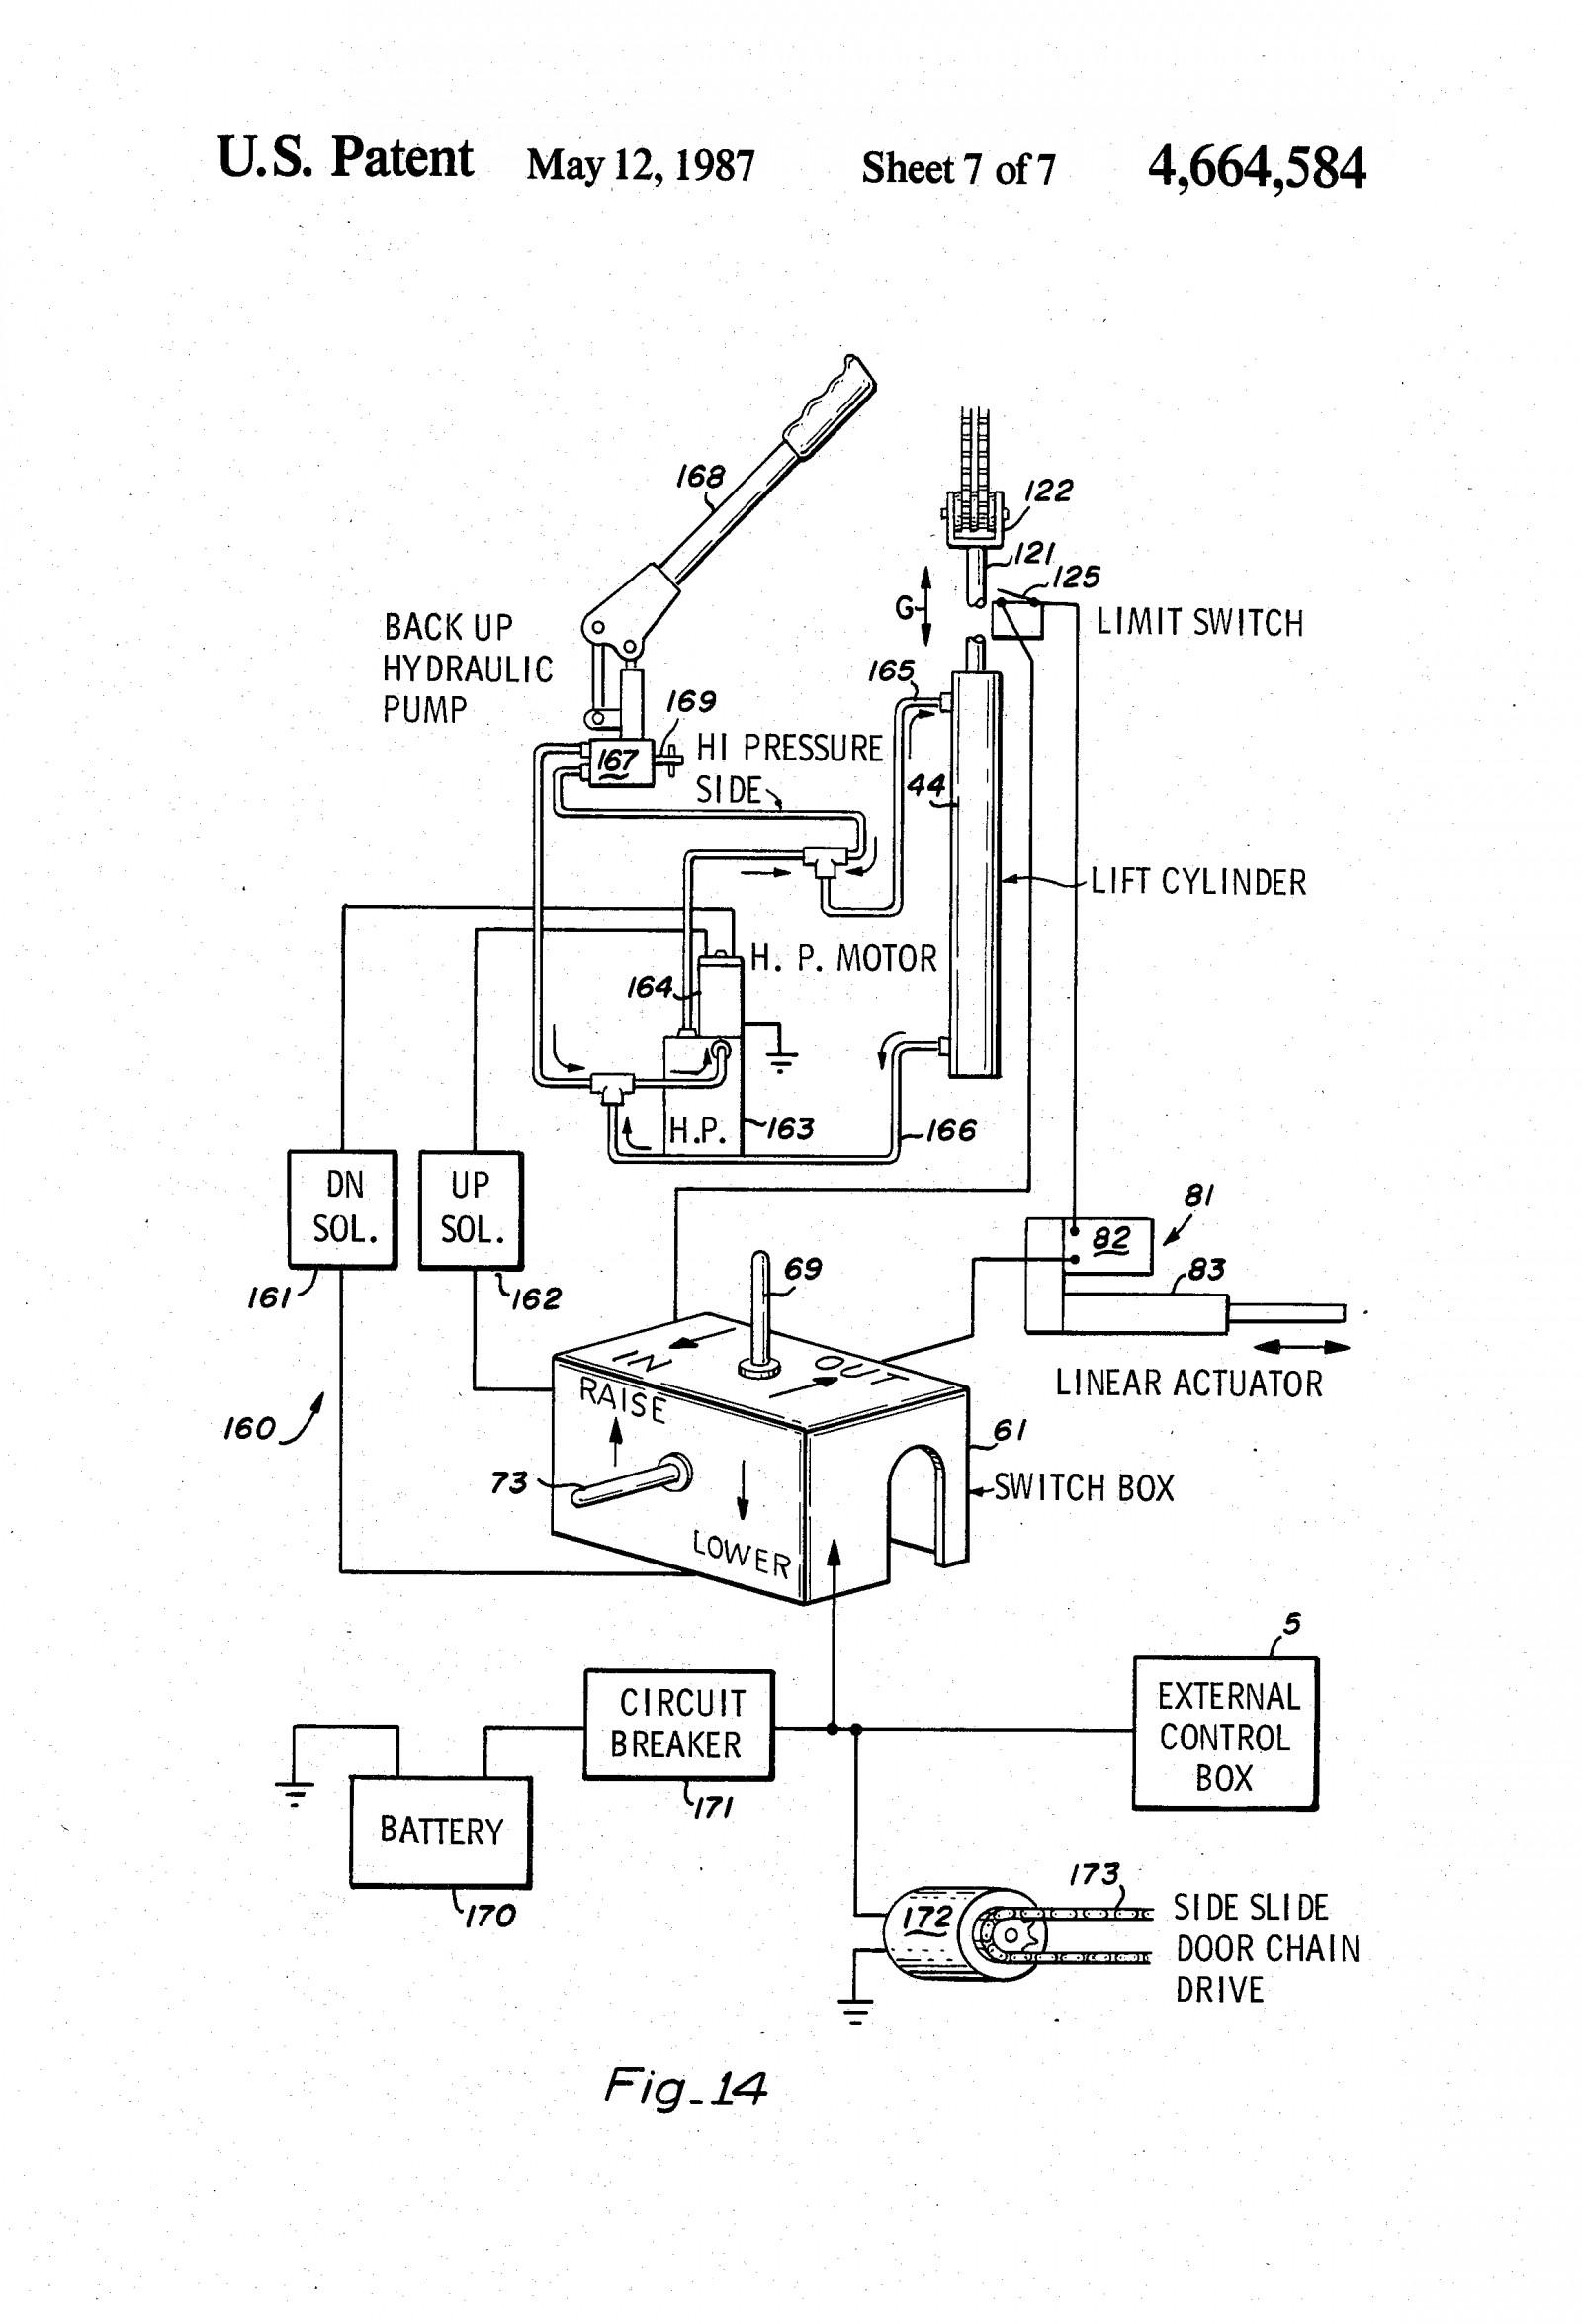 ... Diagram Upright Scissor Lift Wiring Mx19 Sl Dimension Tiger Lines 1600